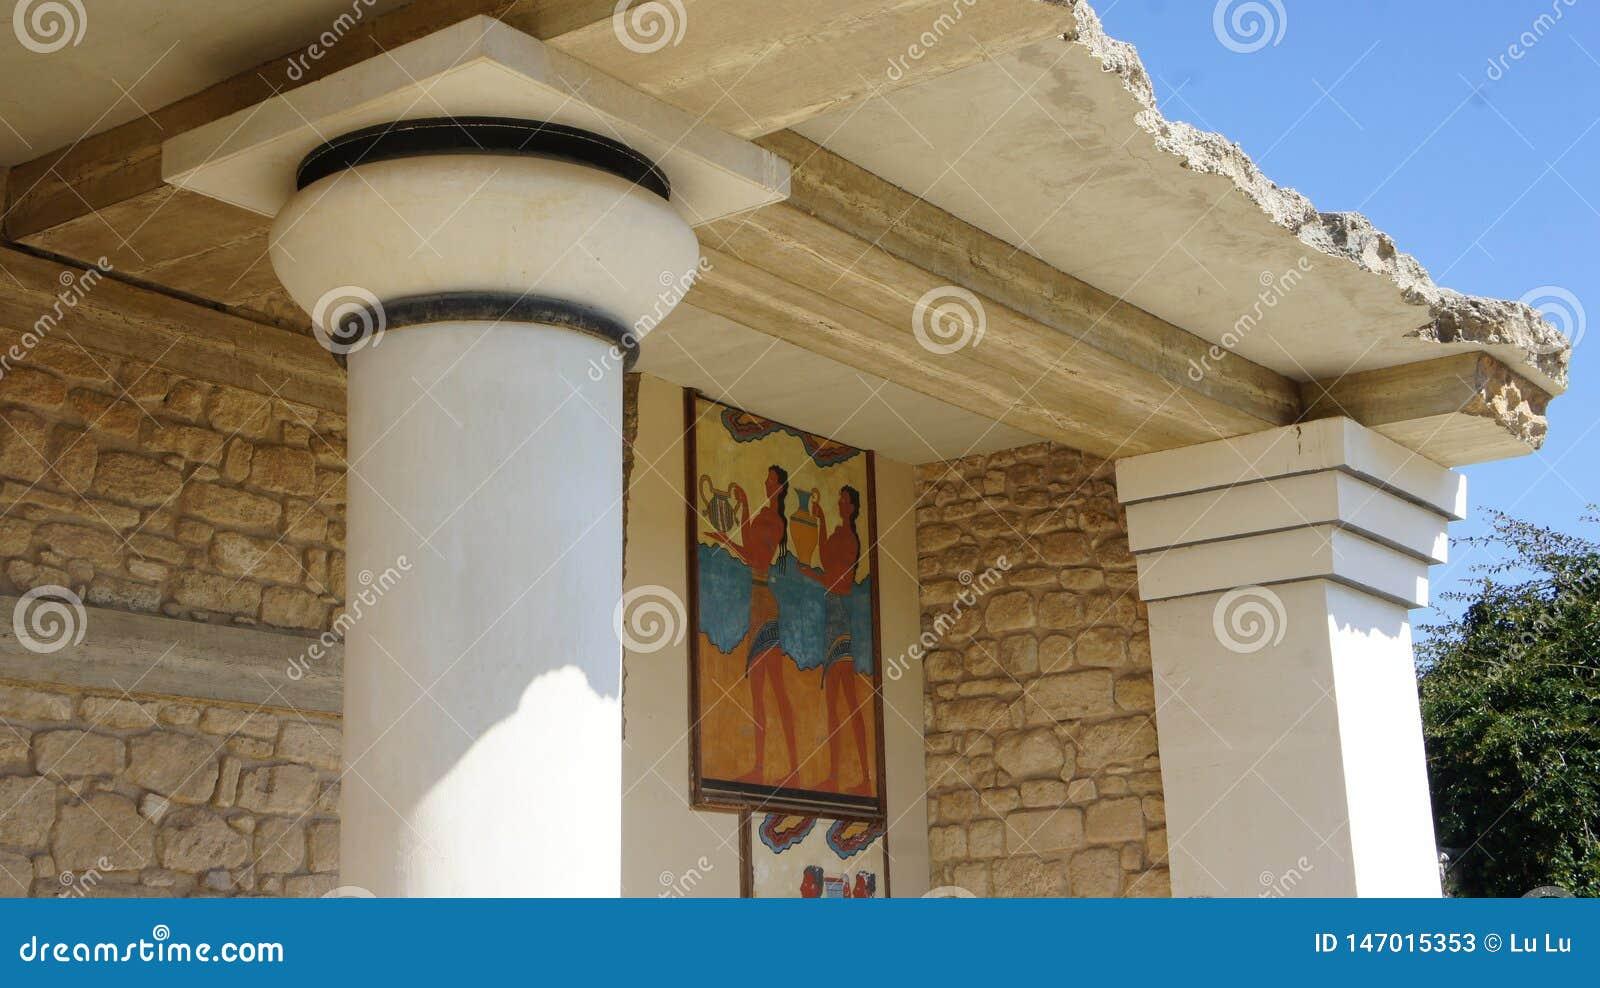 Le Roi Minos De Ville De Colonne De Temple De Crete Cnossos Photo Stock Editorial Image Du Minos Ruine 147015353